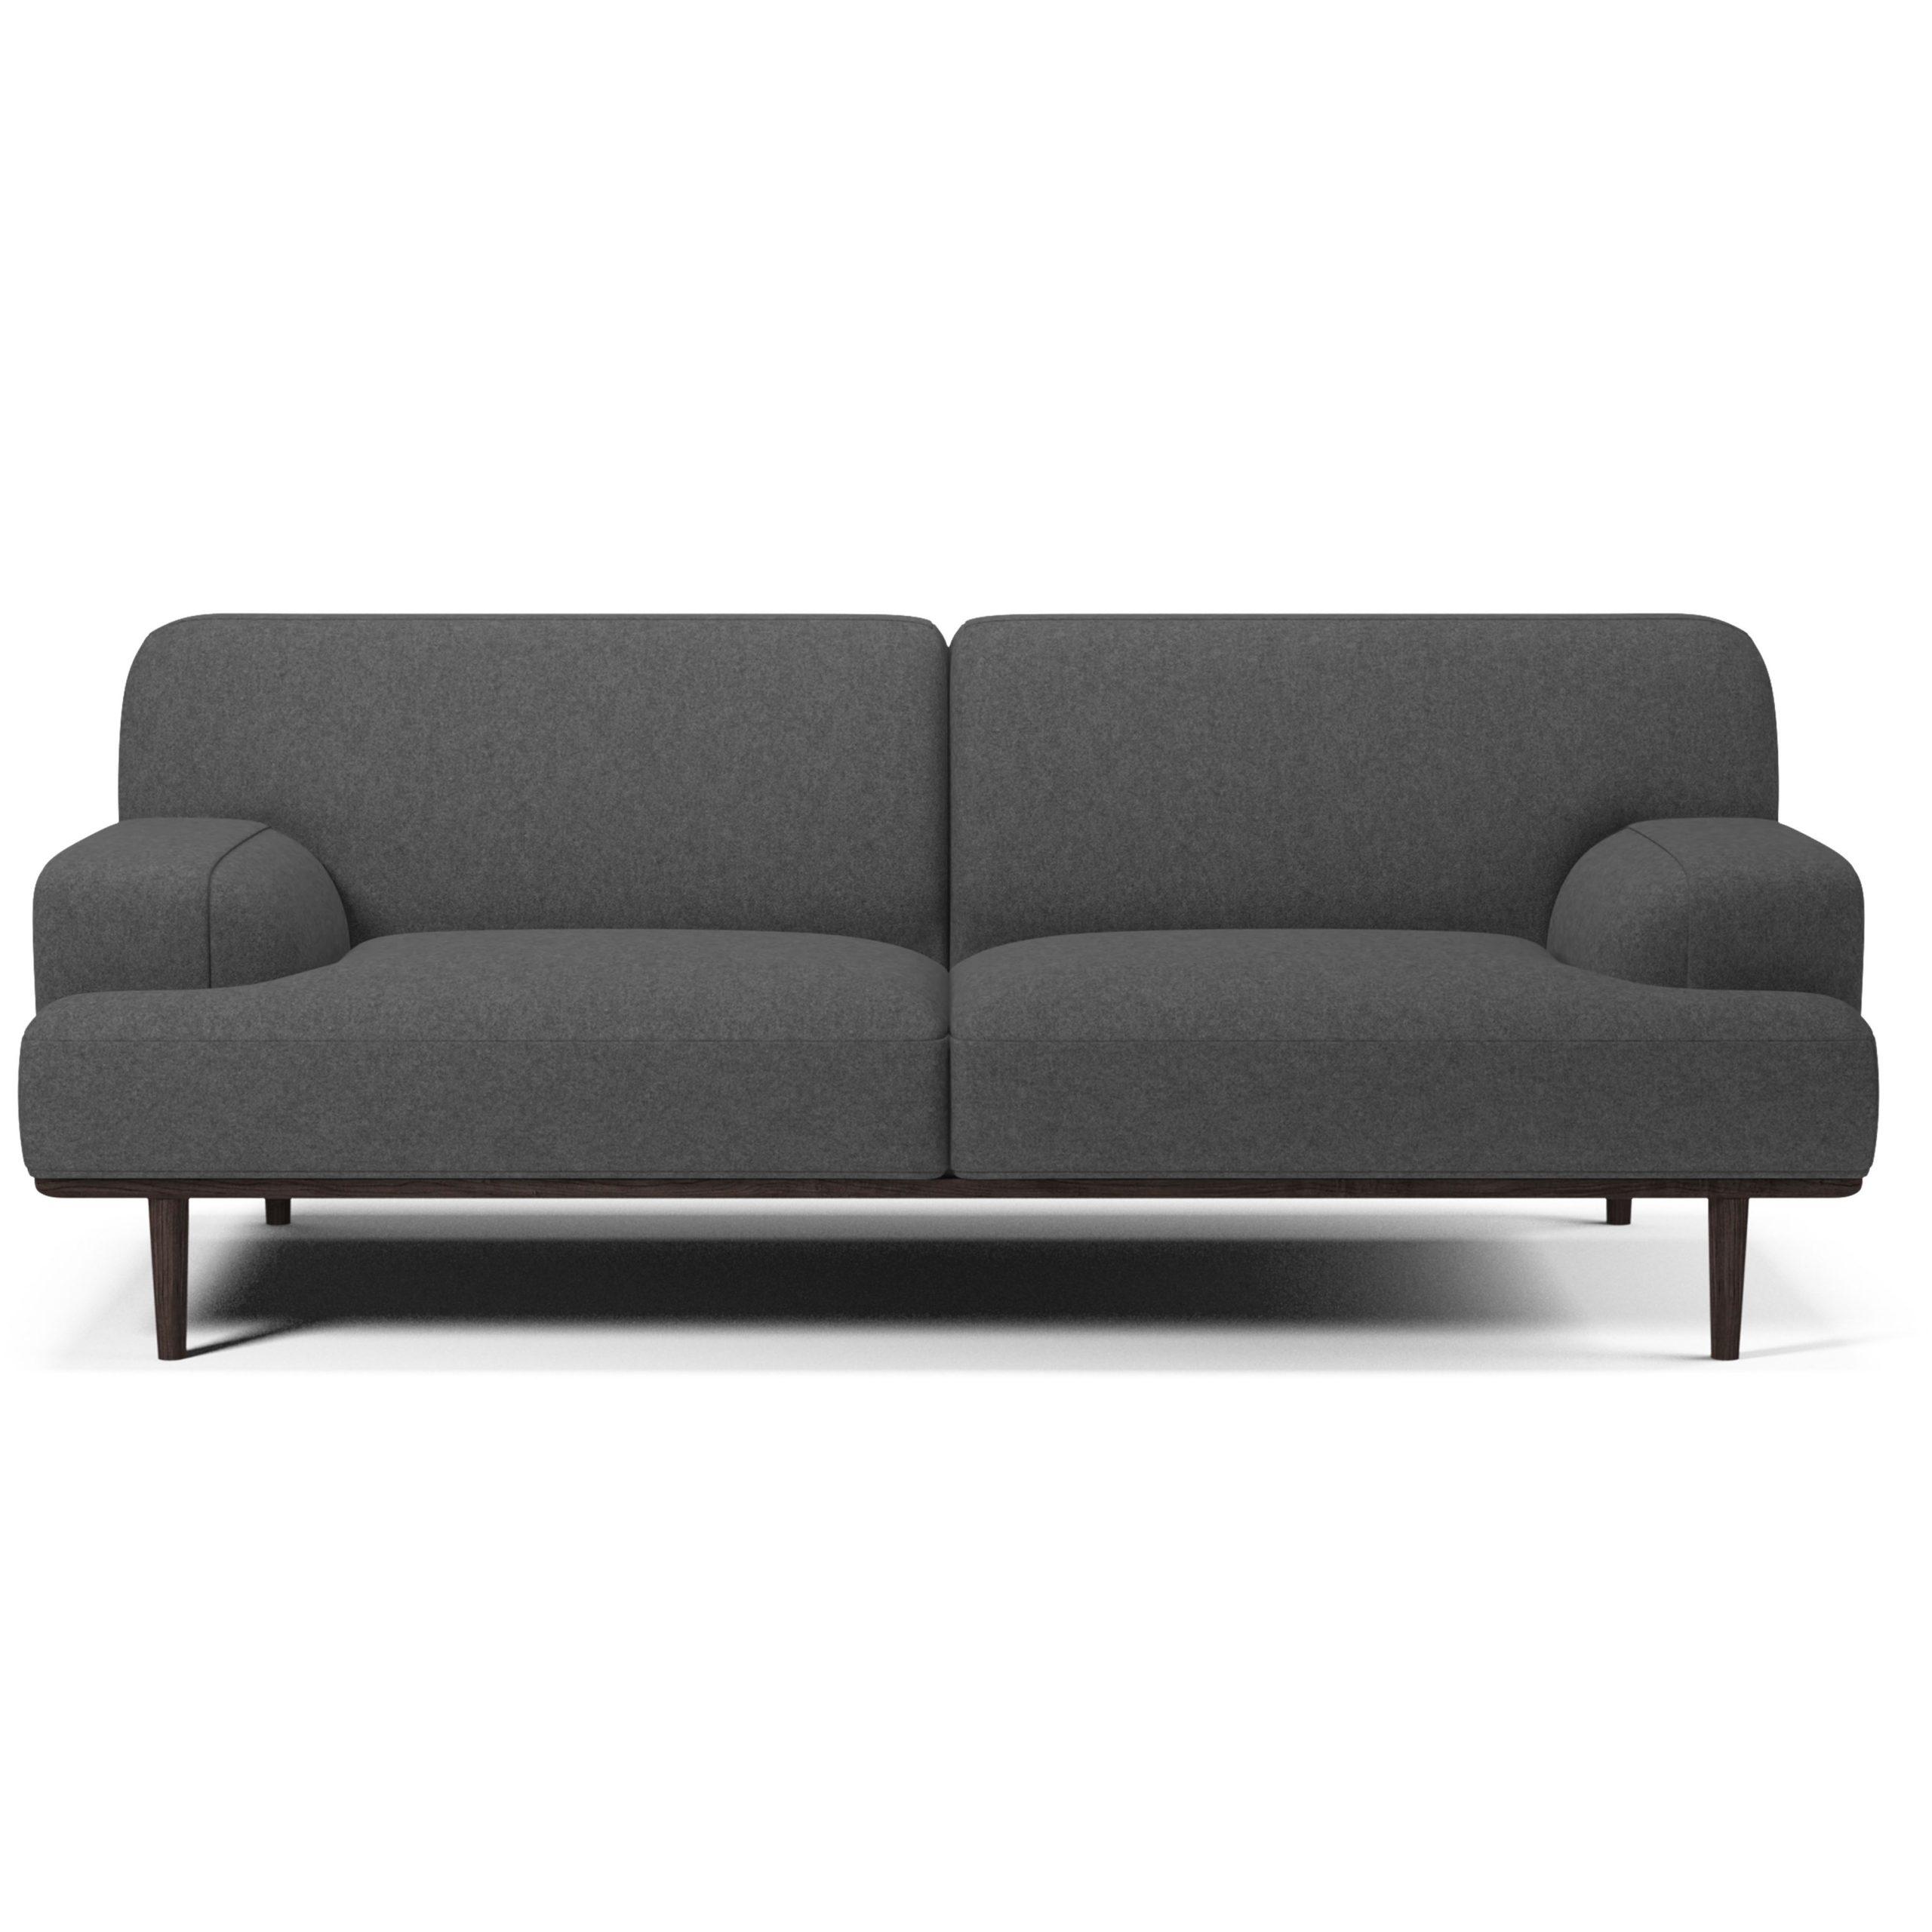 "Madison 2"" seater sofa"